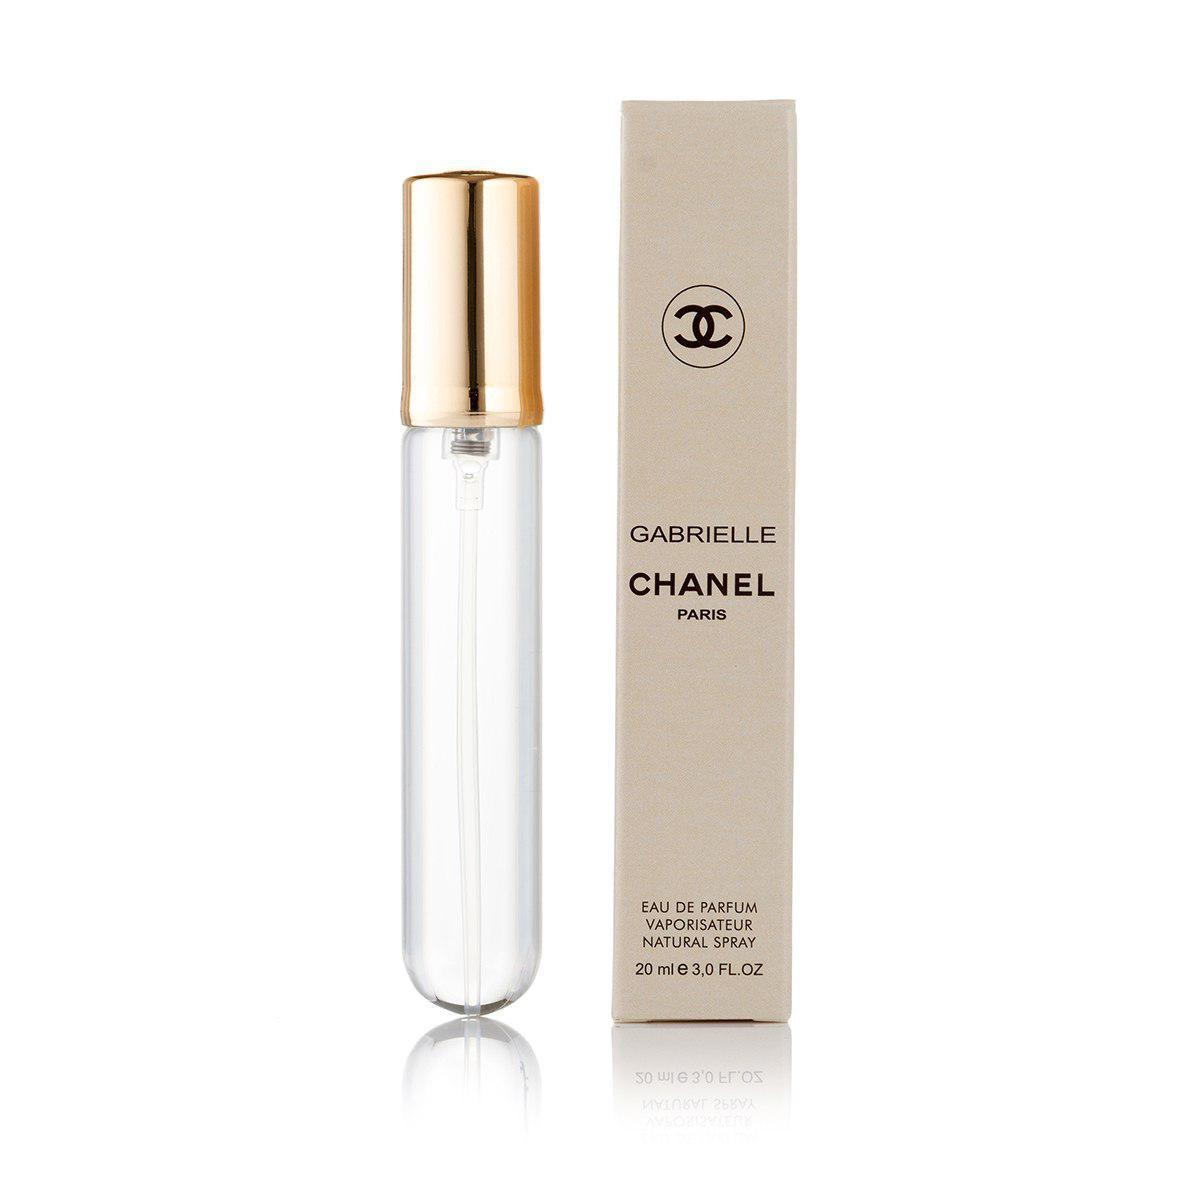 Мини парфюм ручка Gabrielle для женщин -  20 мл